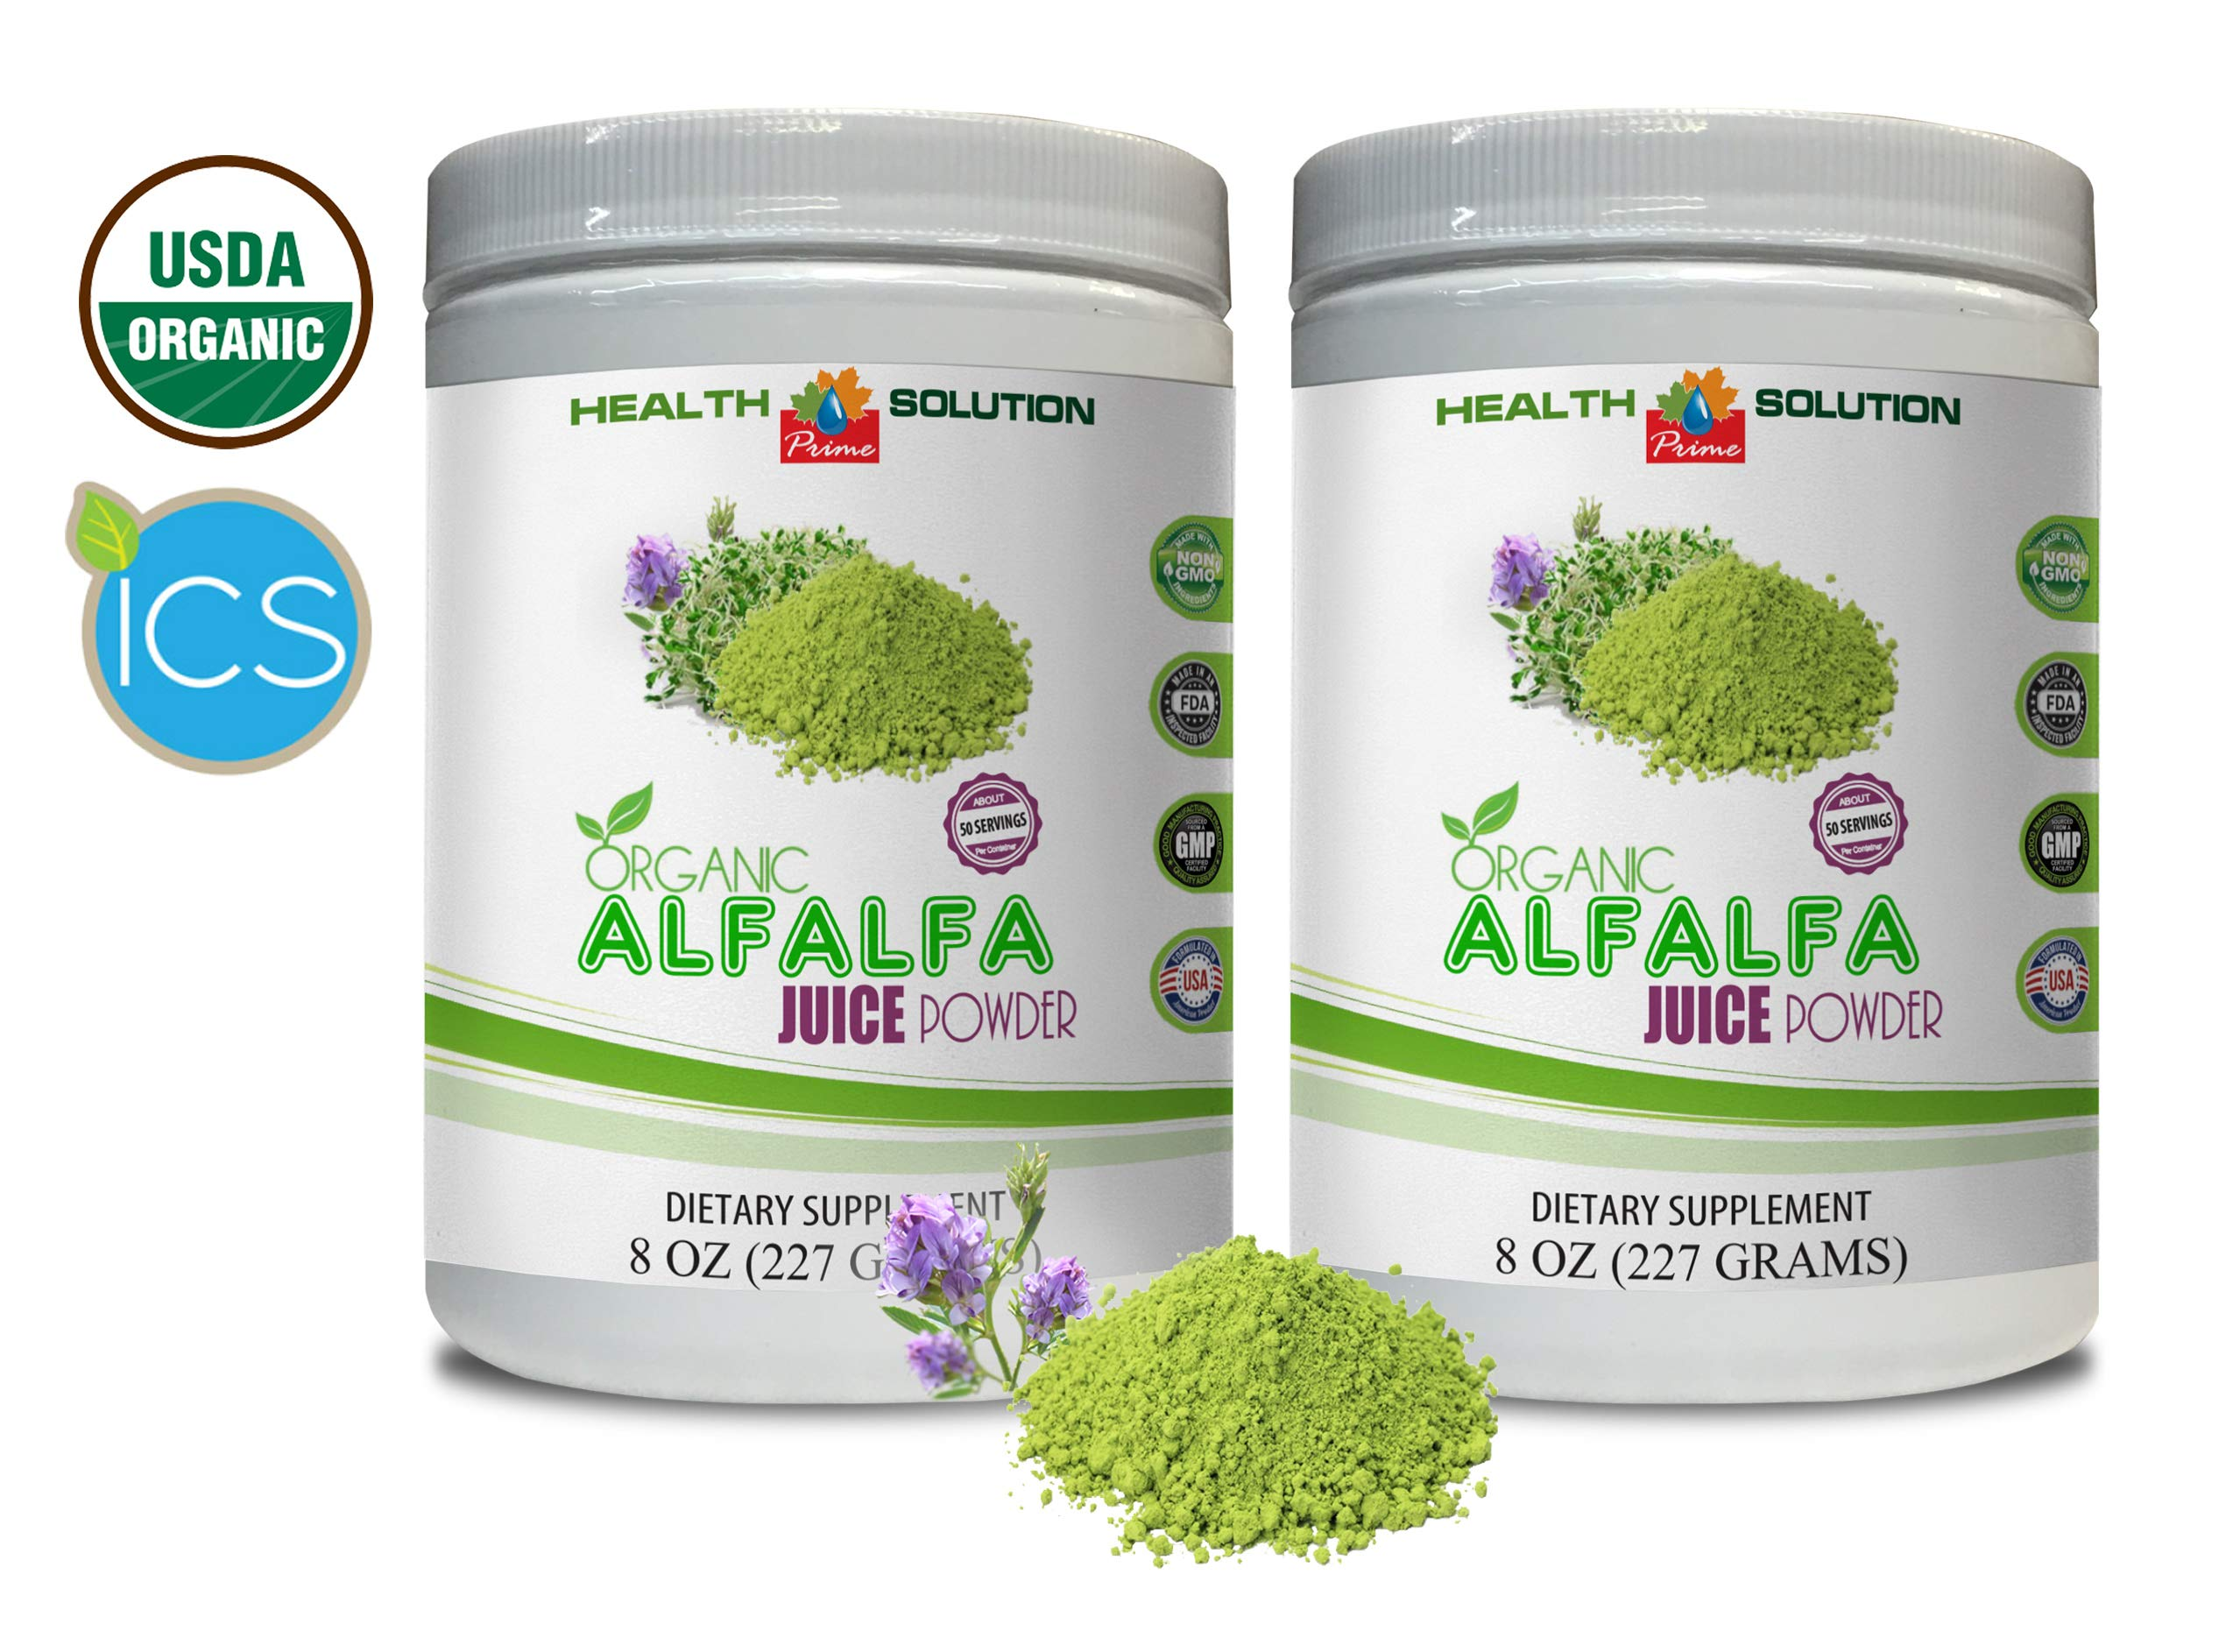 antioxidant Extreme Organic Powder - Organic Alfalfa Juice Powder - Alfalfa Vitamins - 2 Cans 16 OZ (100 Servings)